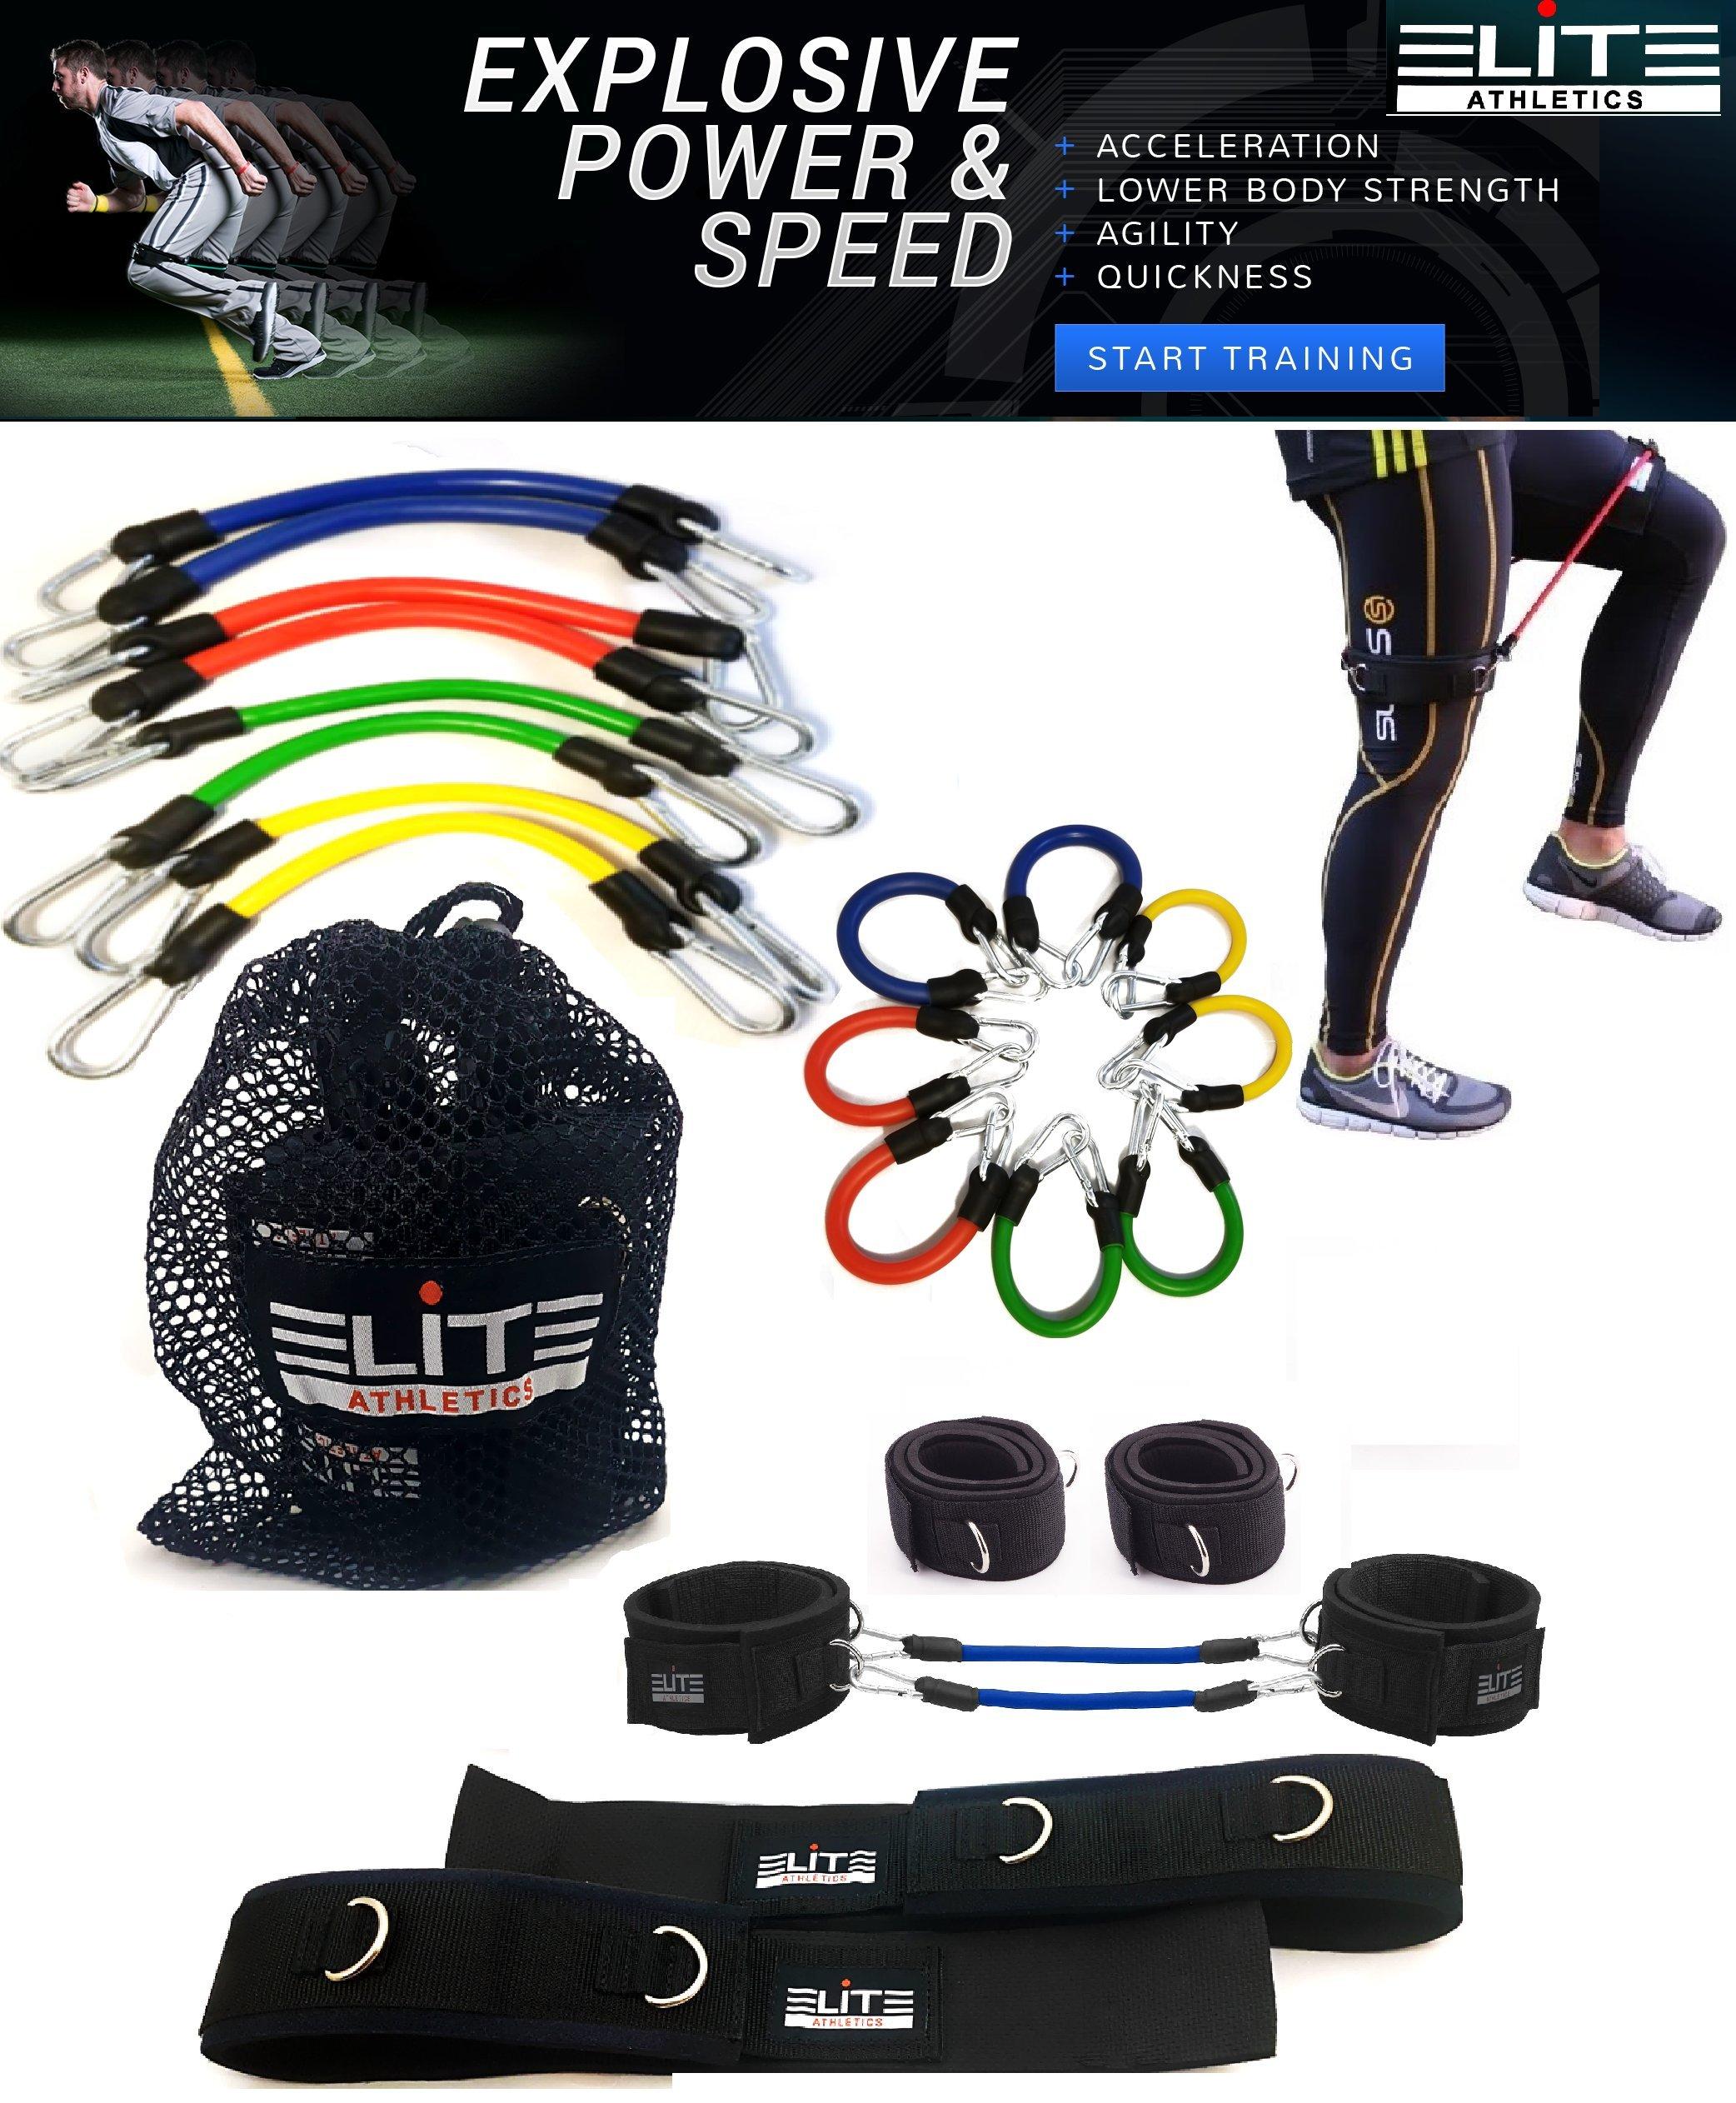 Kinetic Speed Agility Training Strength Leg Resistance